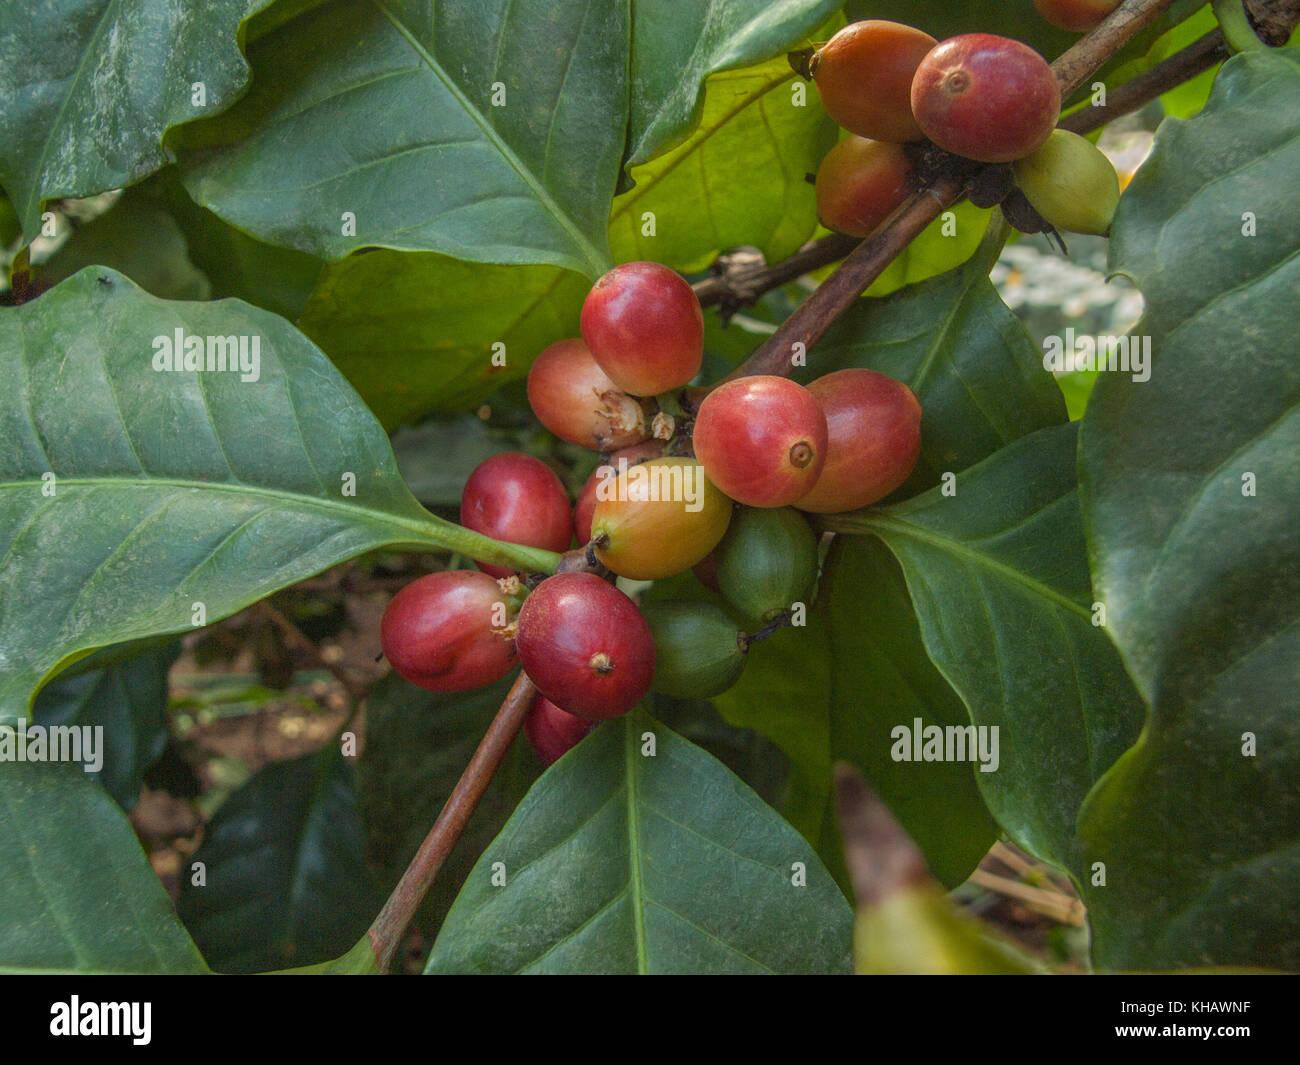 Foliage and berries of the Arabian Coffee plant (Coffea arabica). - Stock Image